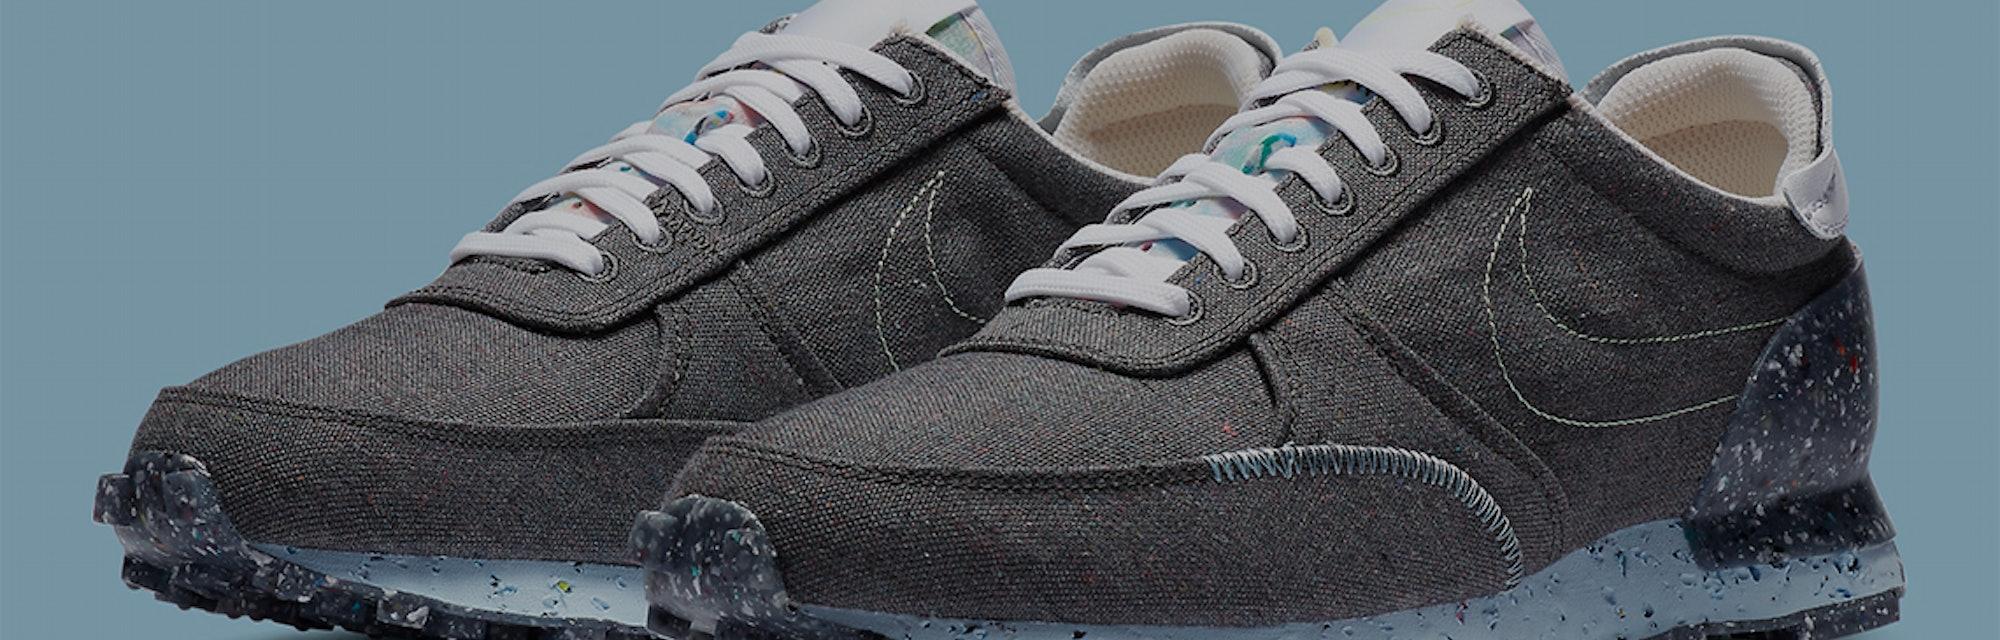 Nike's Crater Daybreak Type sneaker three-quarter view